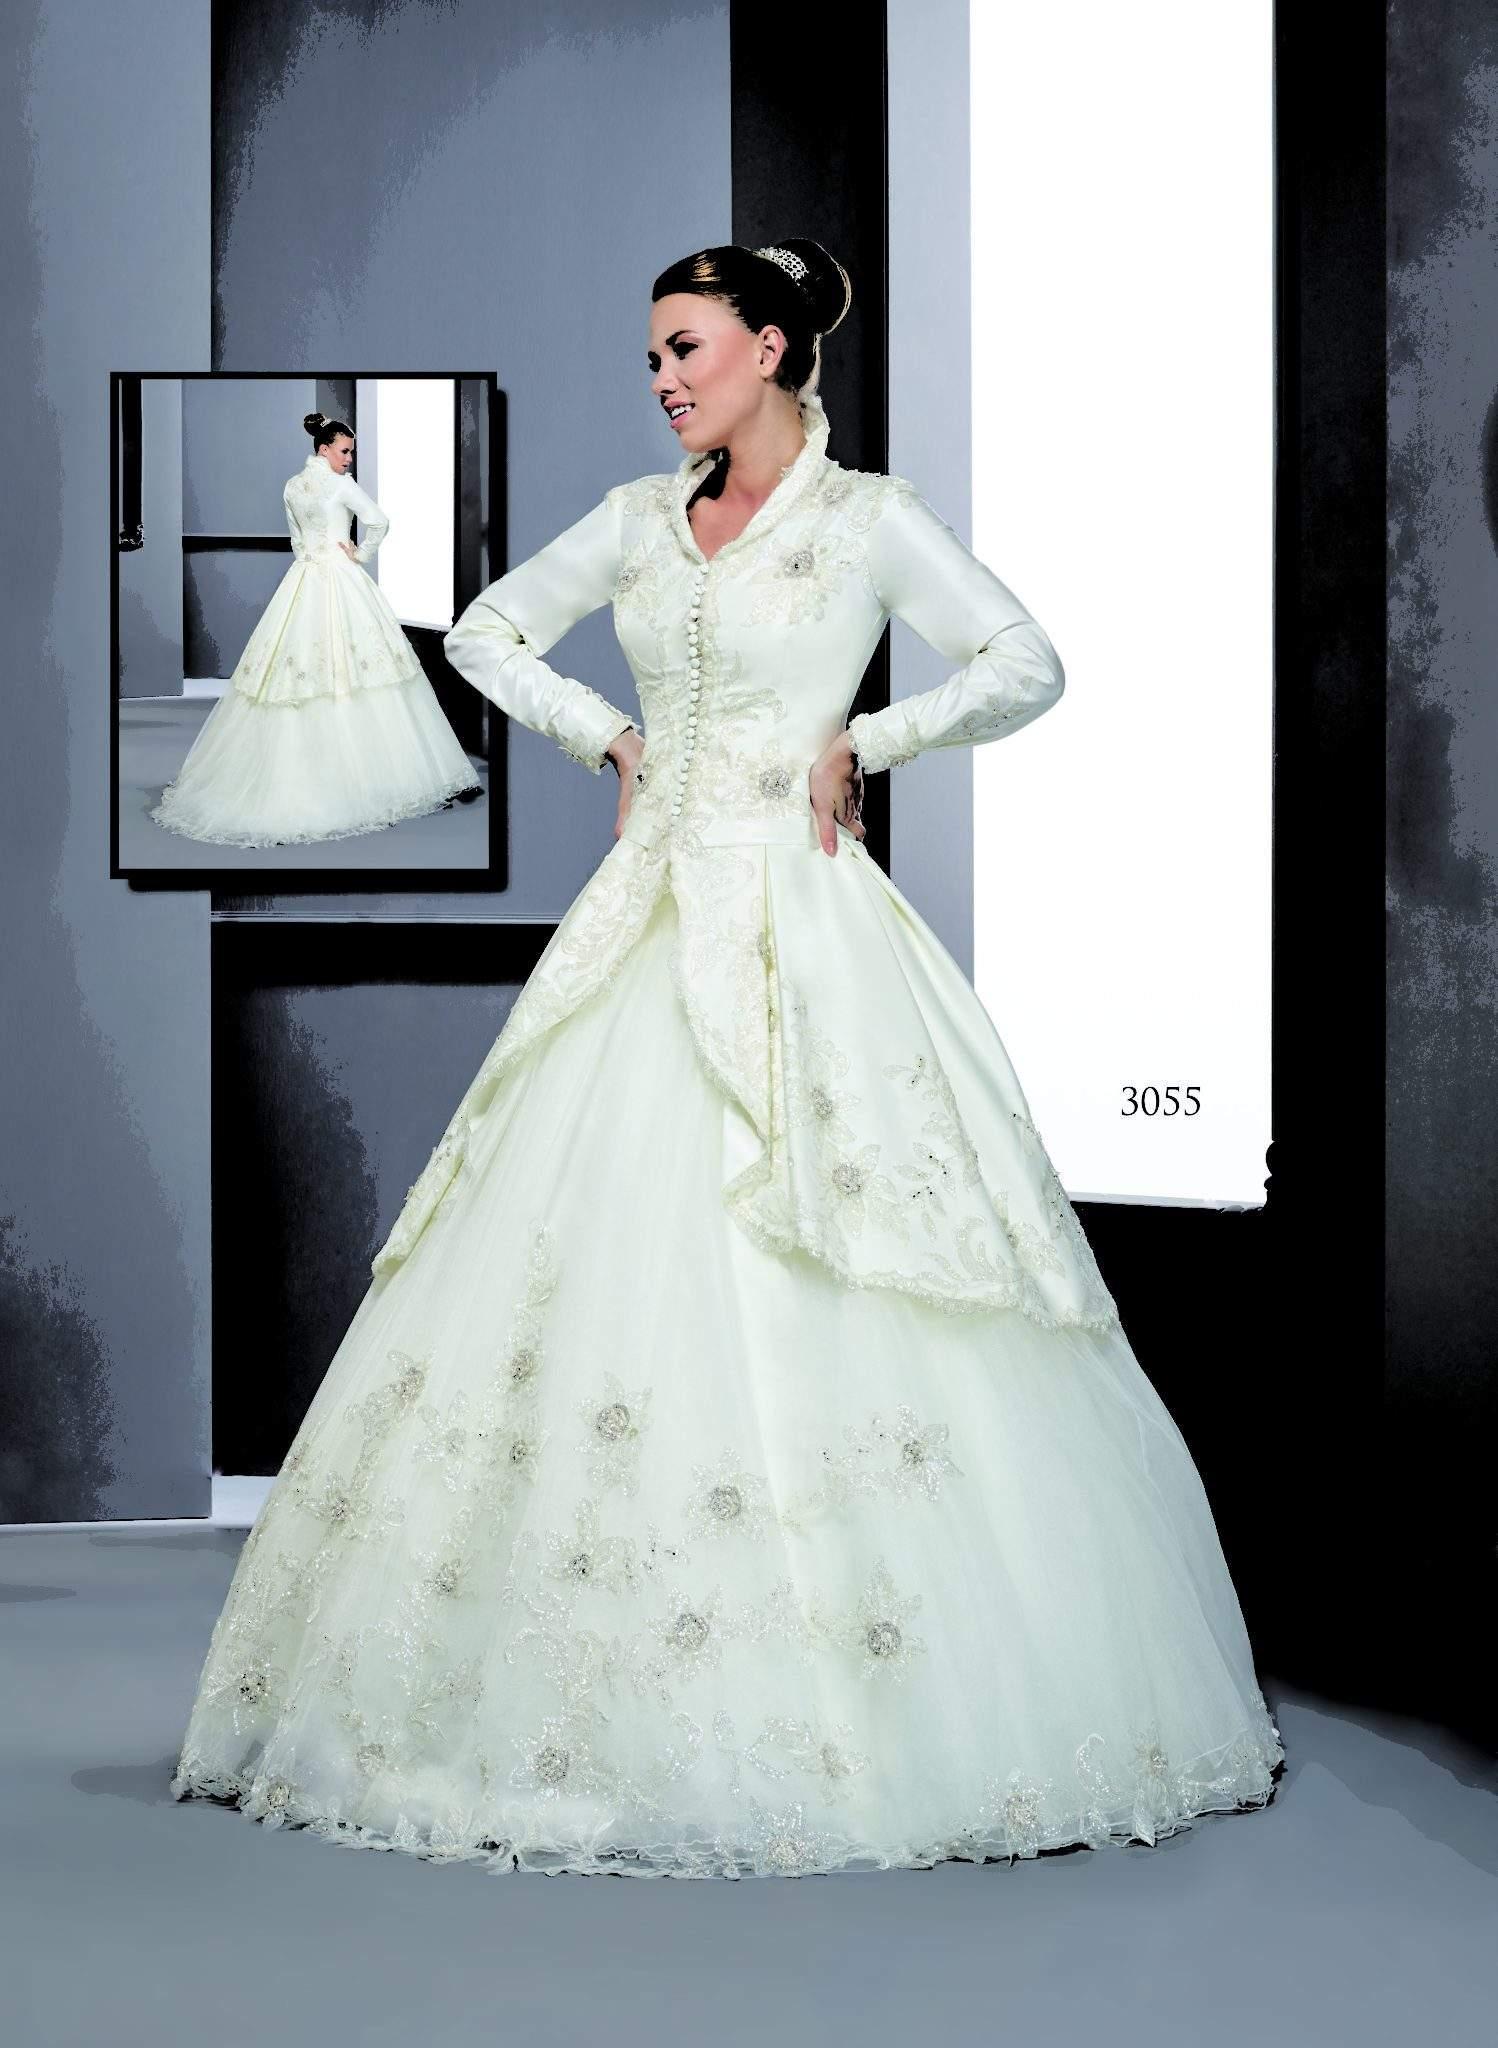 a01029904b Long Sleeve Wedding Dress Coats - Darius Cordell Fashion Ltd